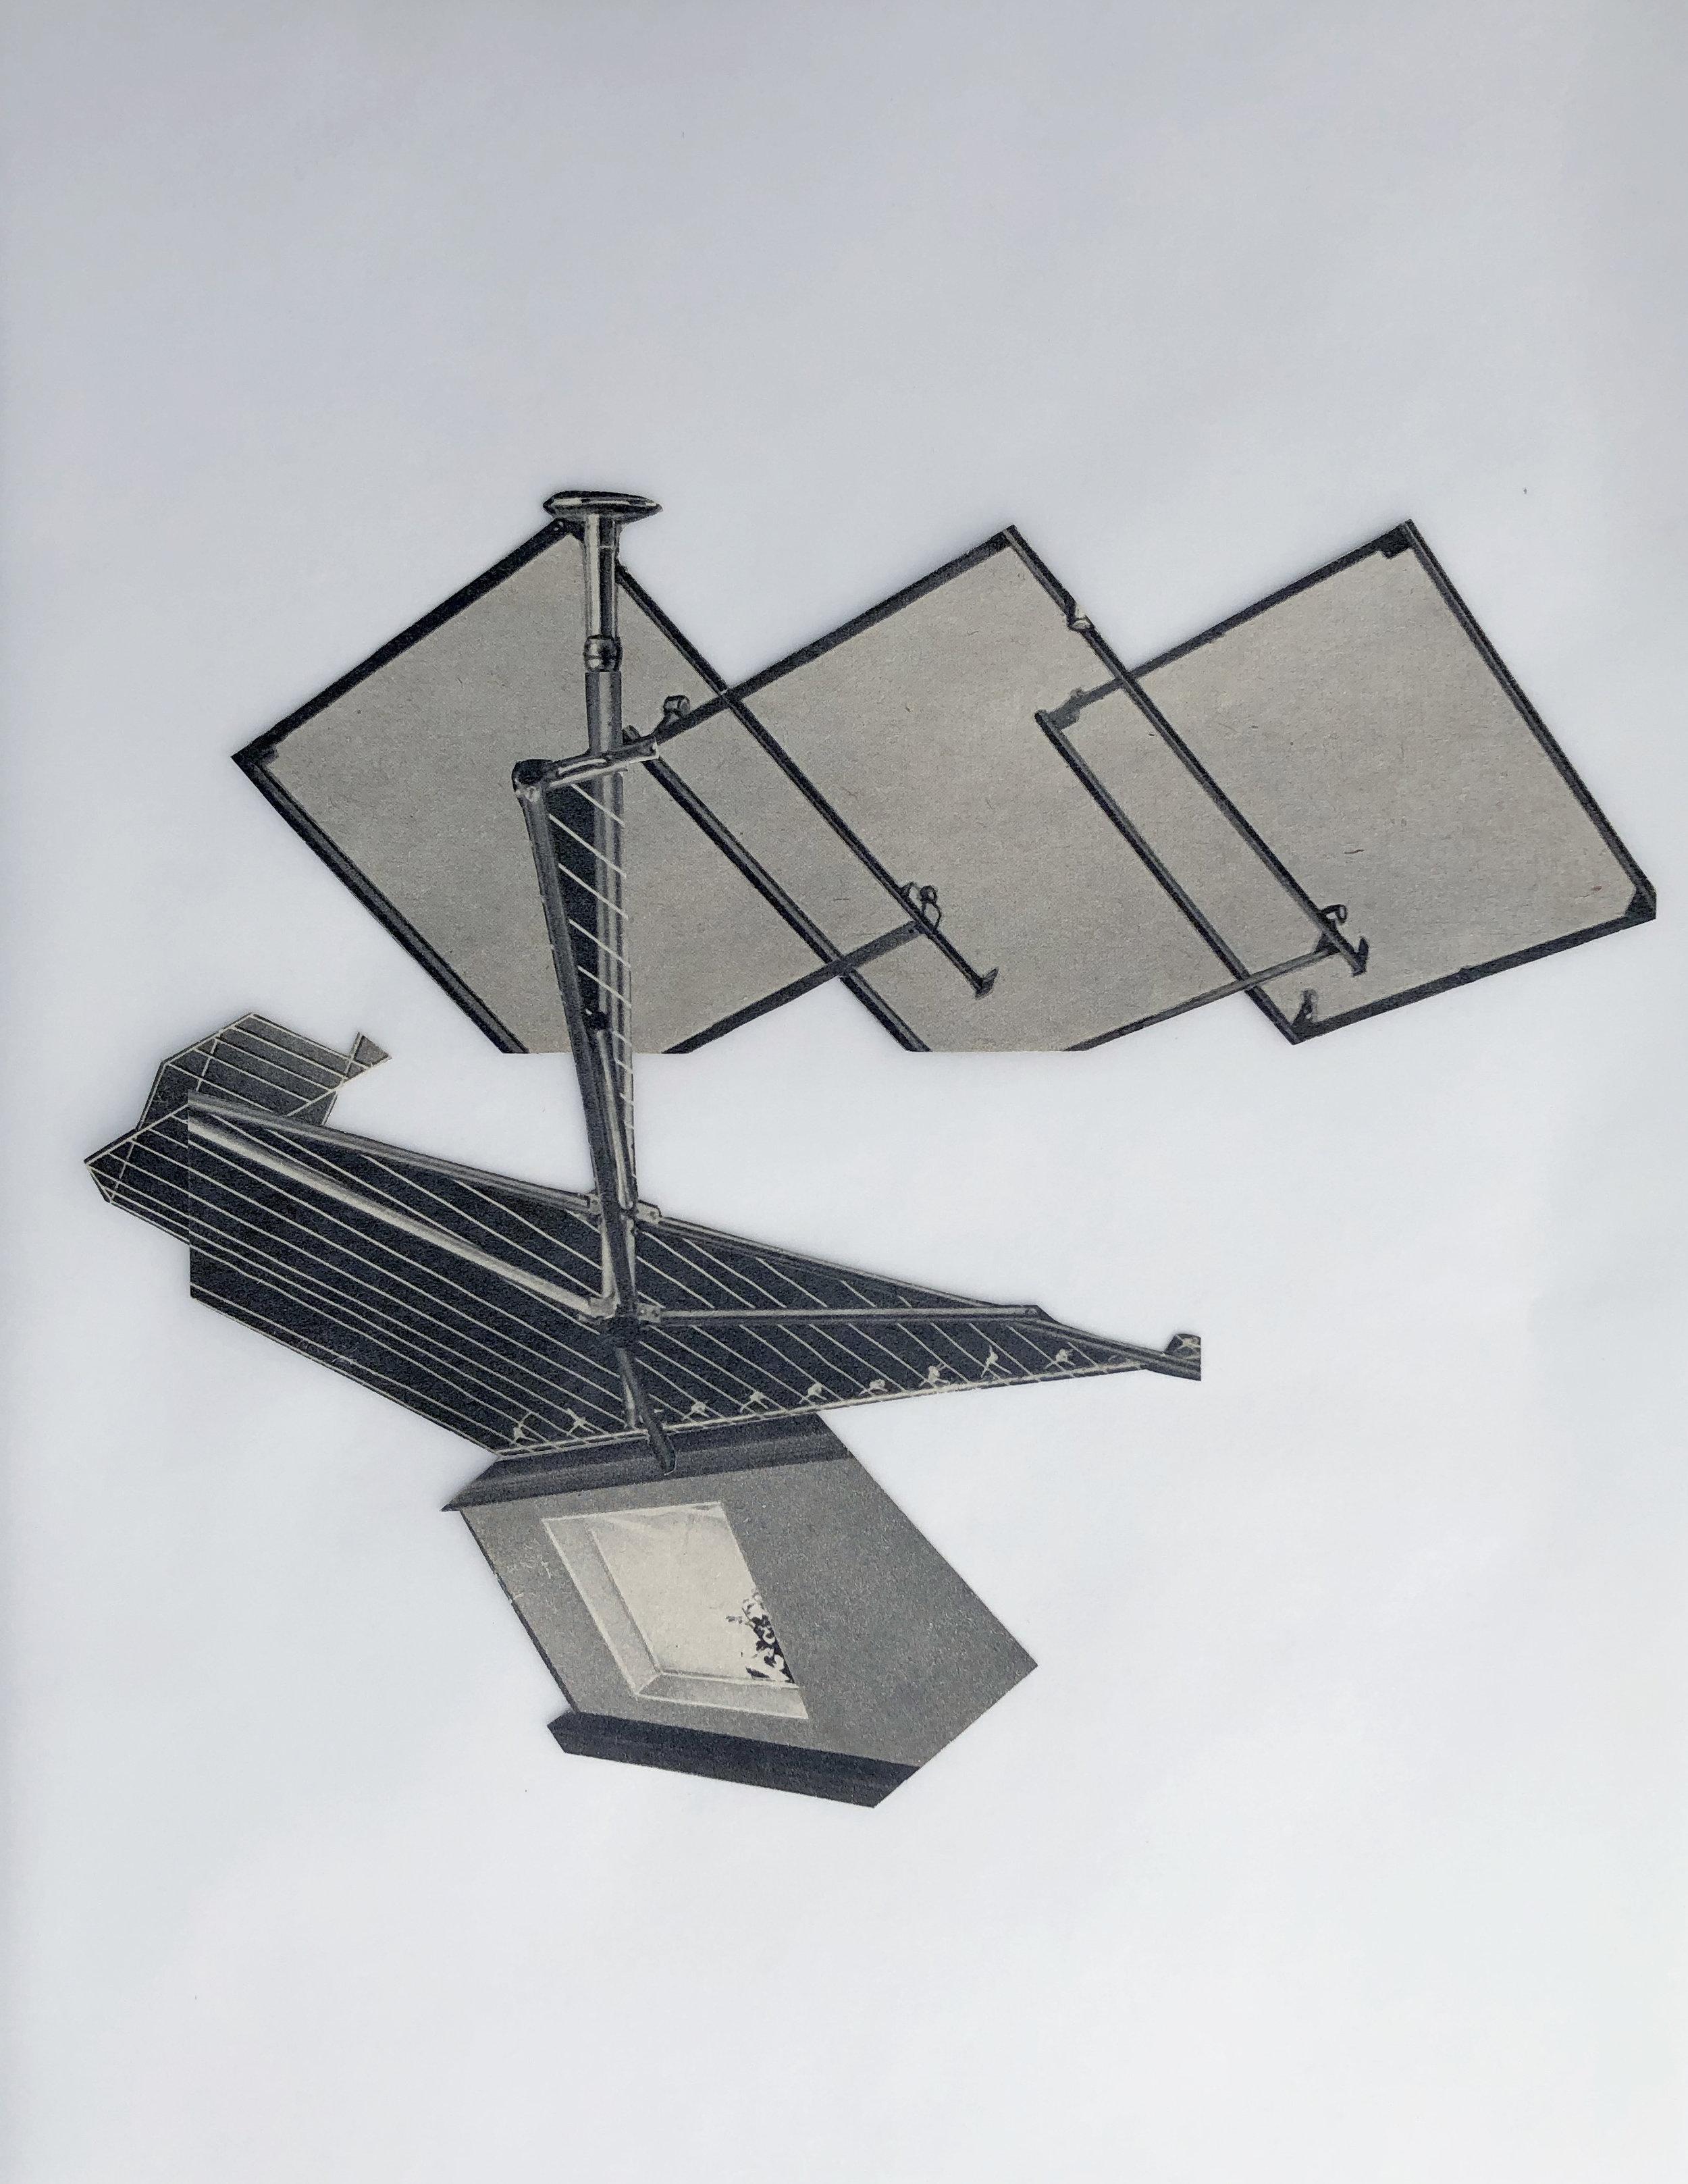 CAT - Starships - satellite - CROP.jpg